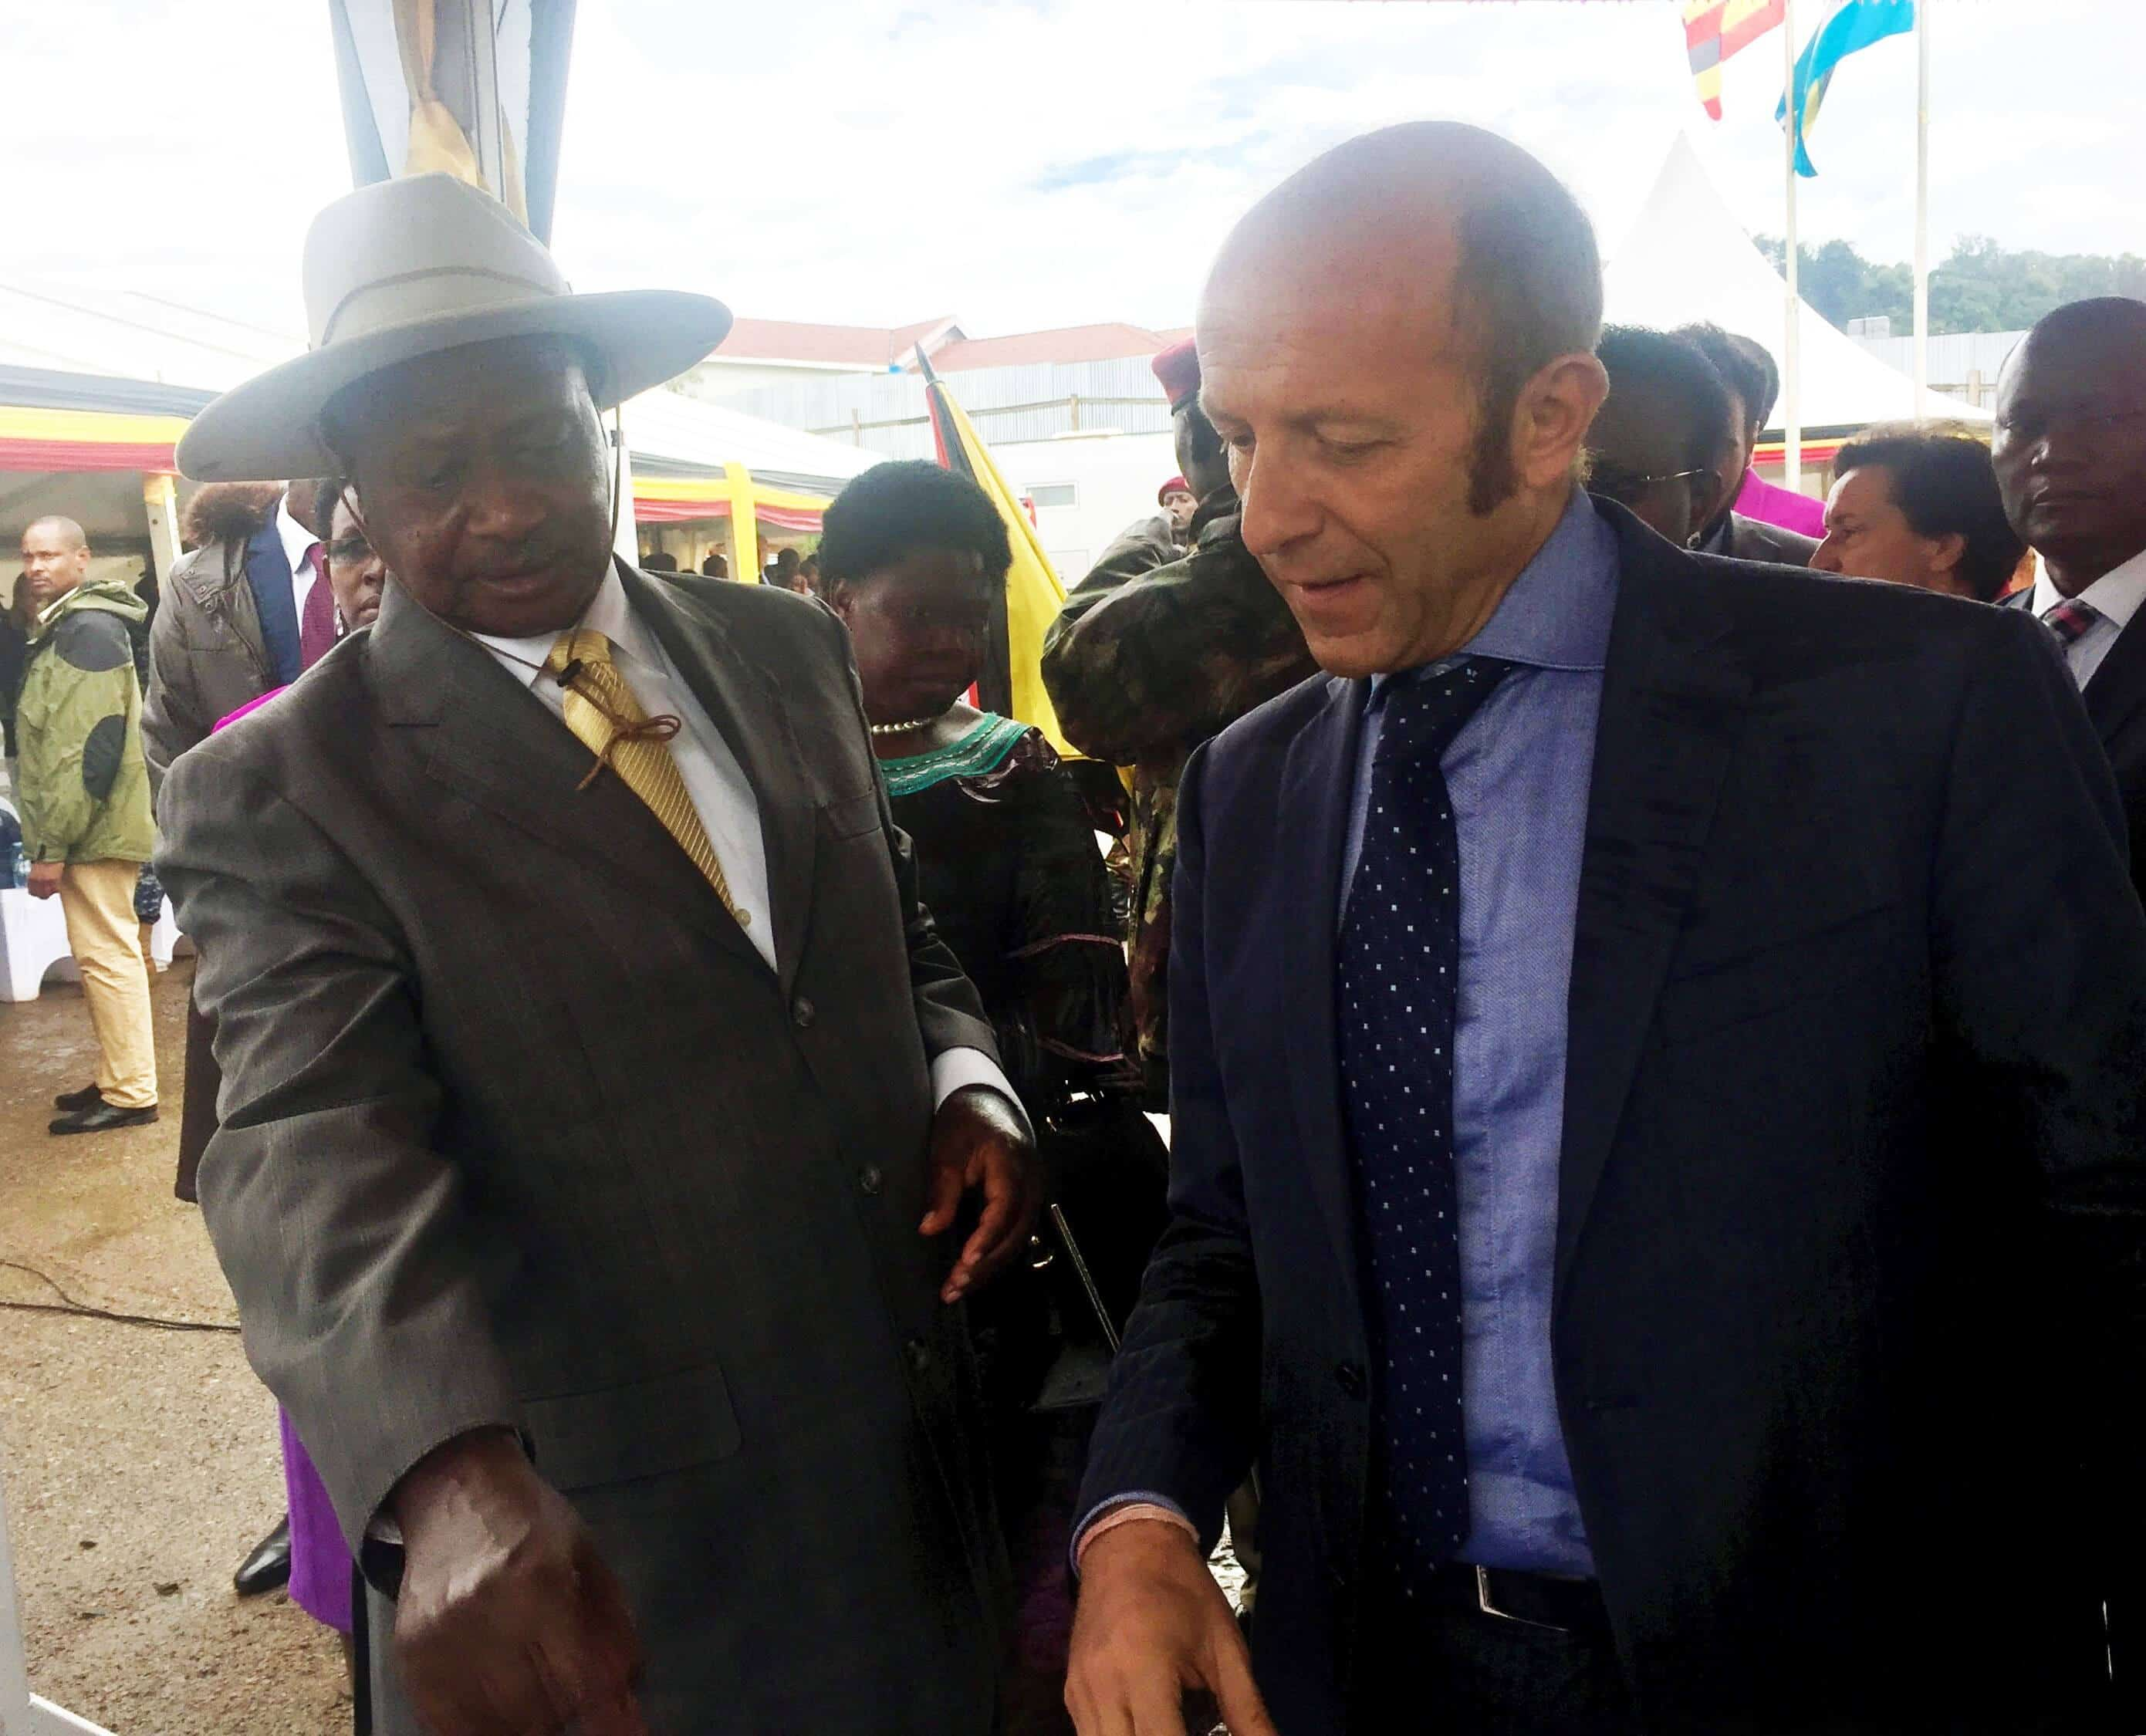 Progetto CMR - International Specialized Hospital of Uganda